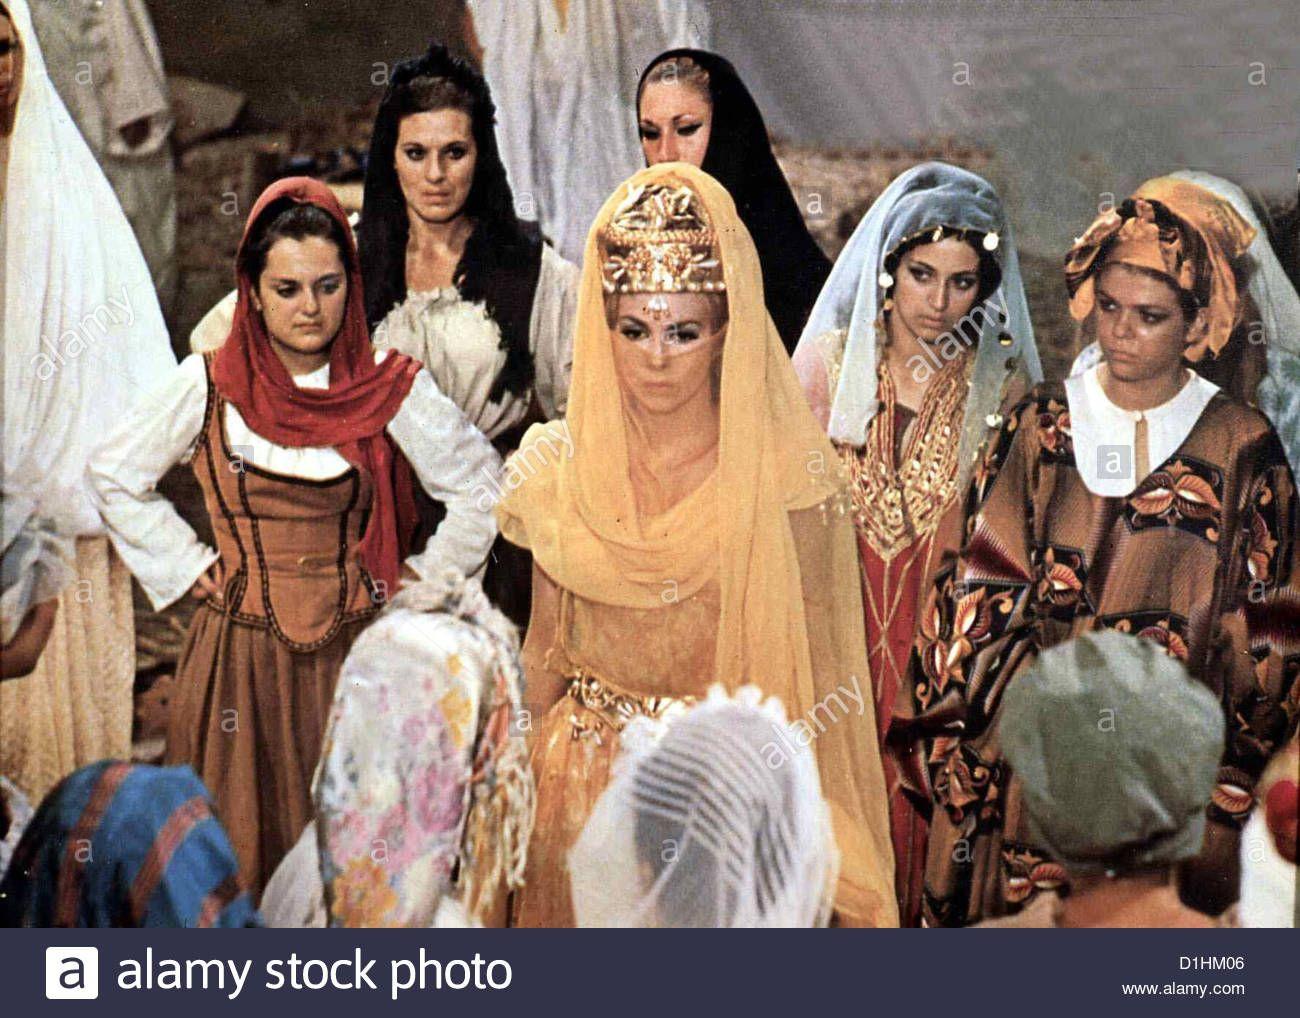 Angélique Und Der Sultan